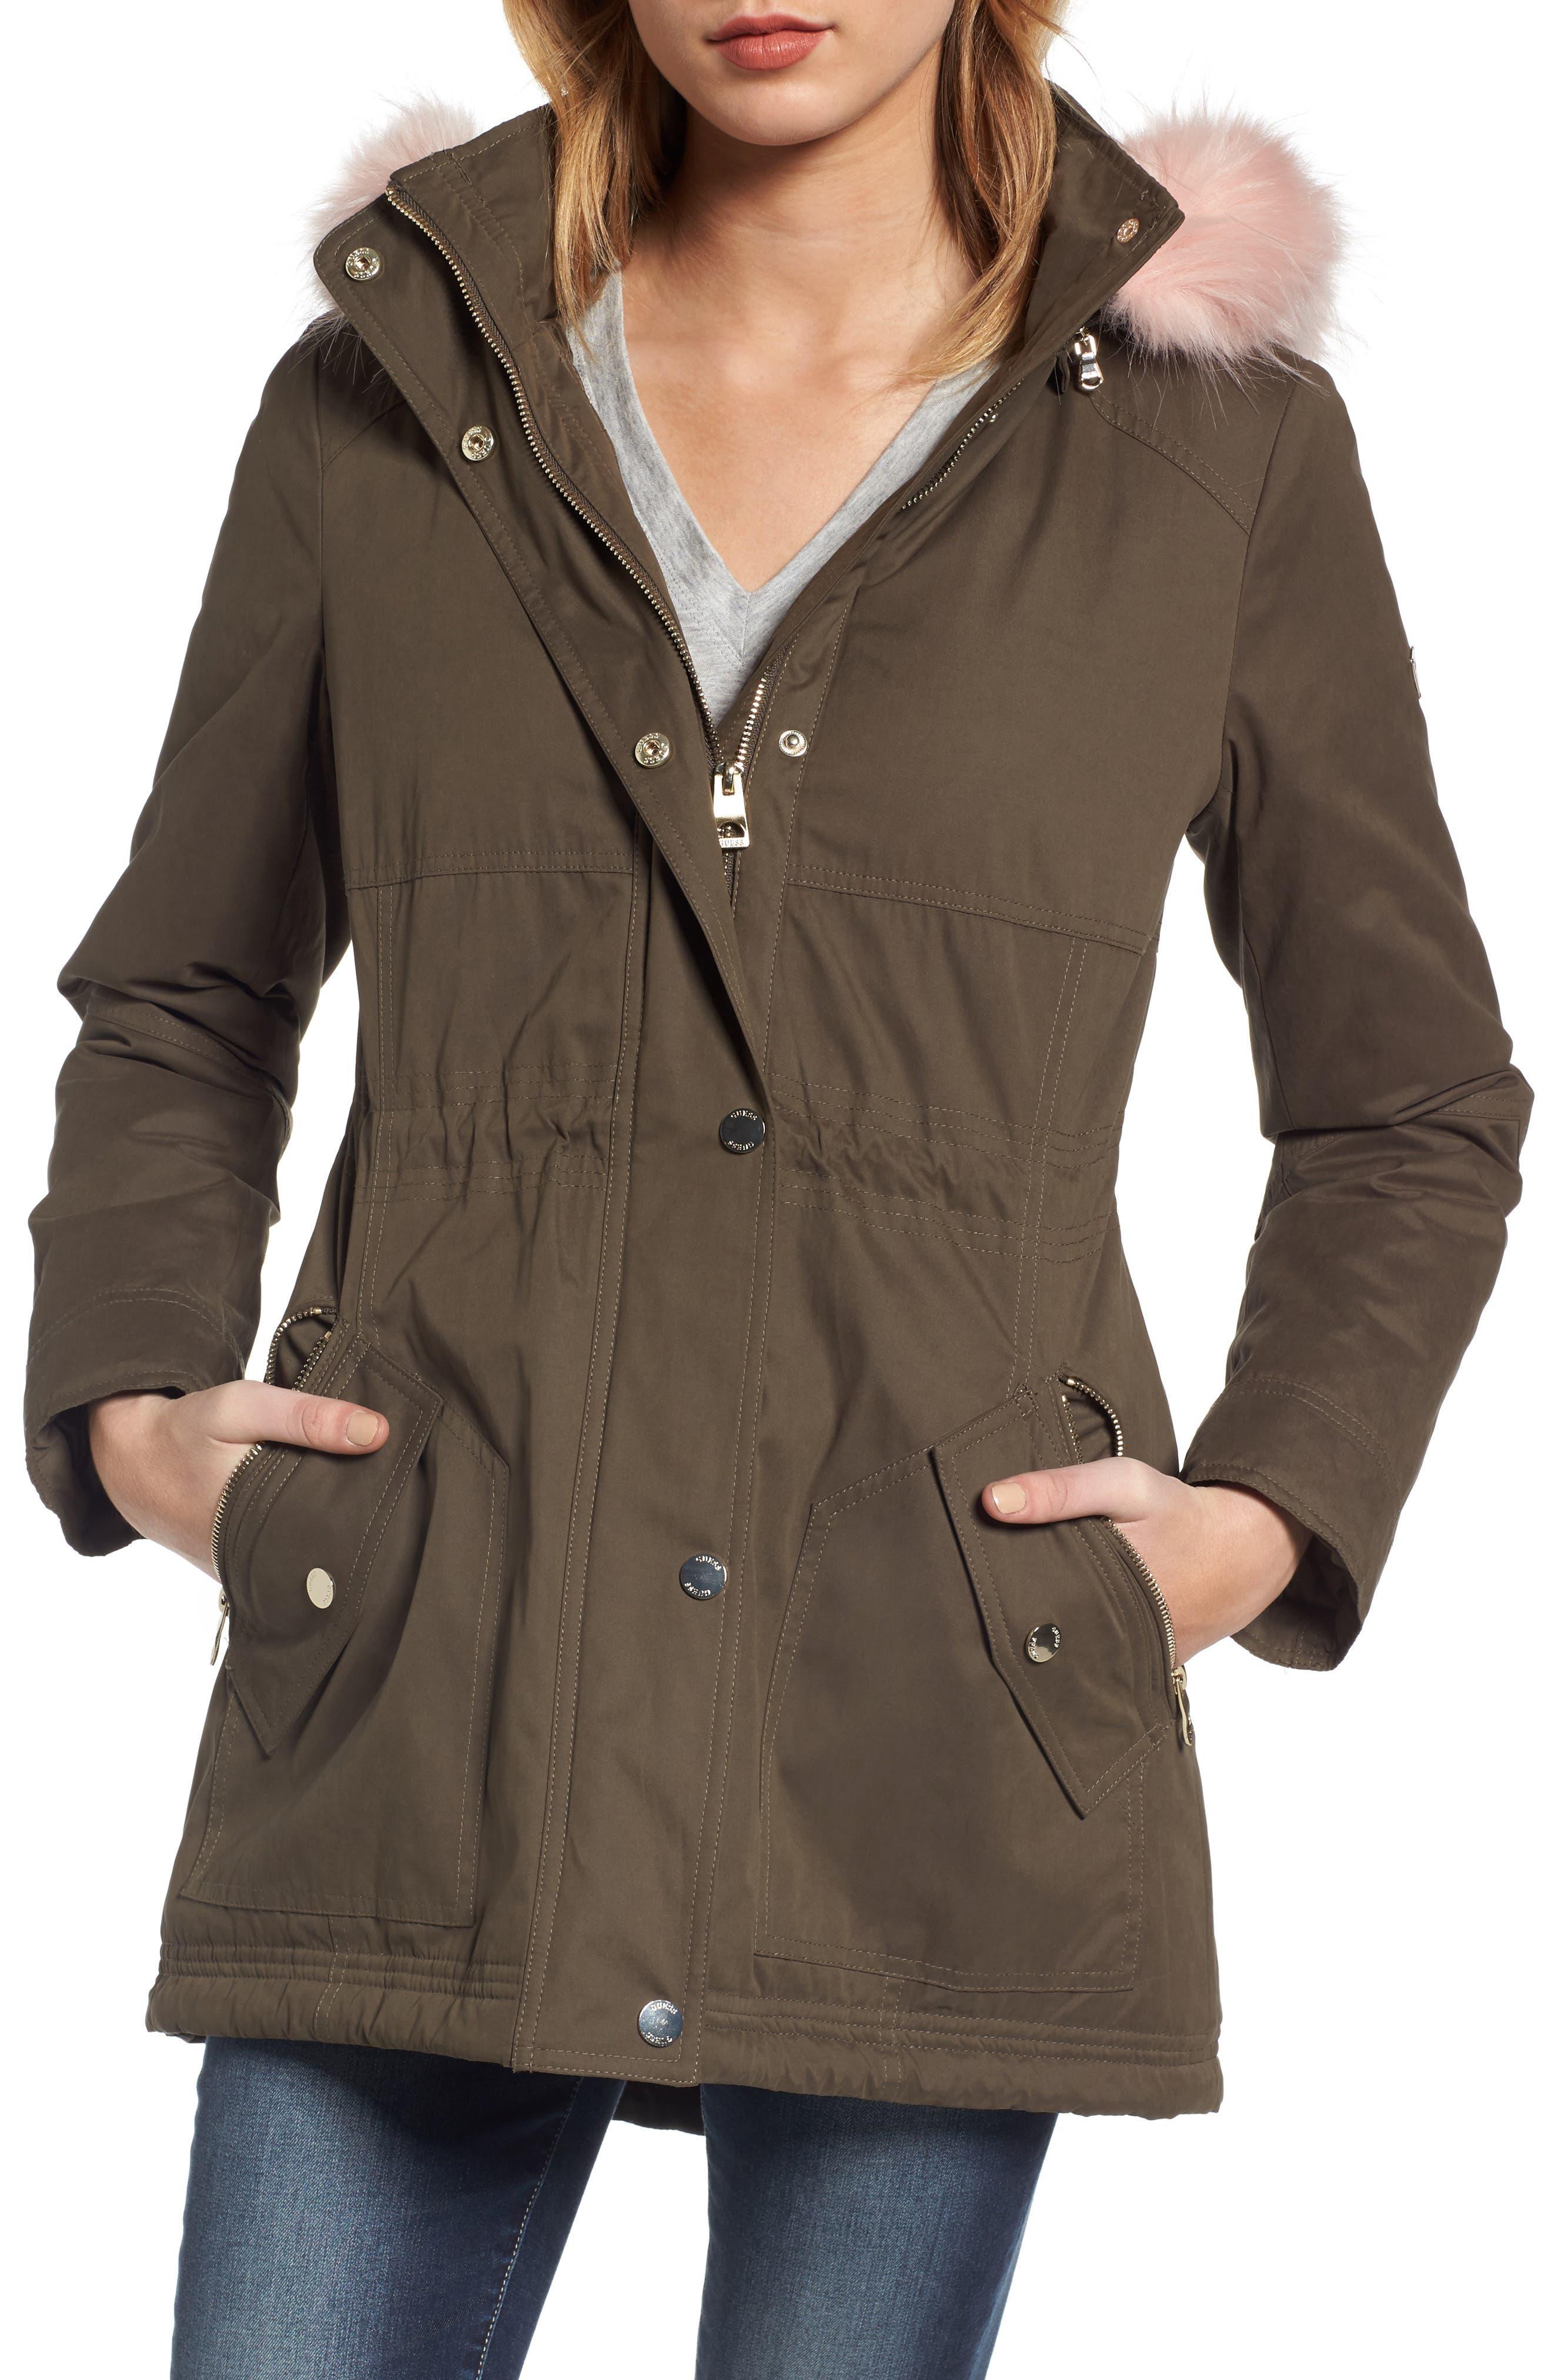 Parka with Removable Faux Fur Trim Hood,                             Main thumbnail 1, color,                             Olive/ Pink Fur